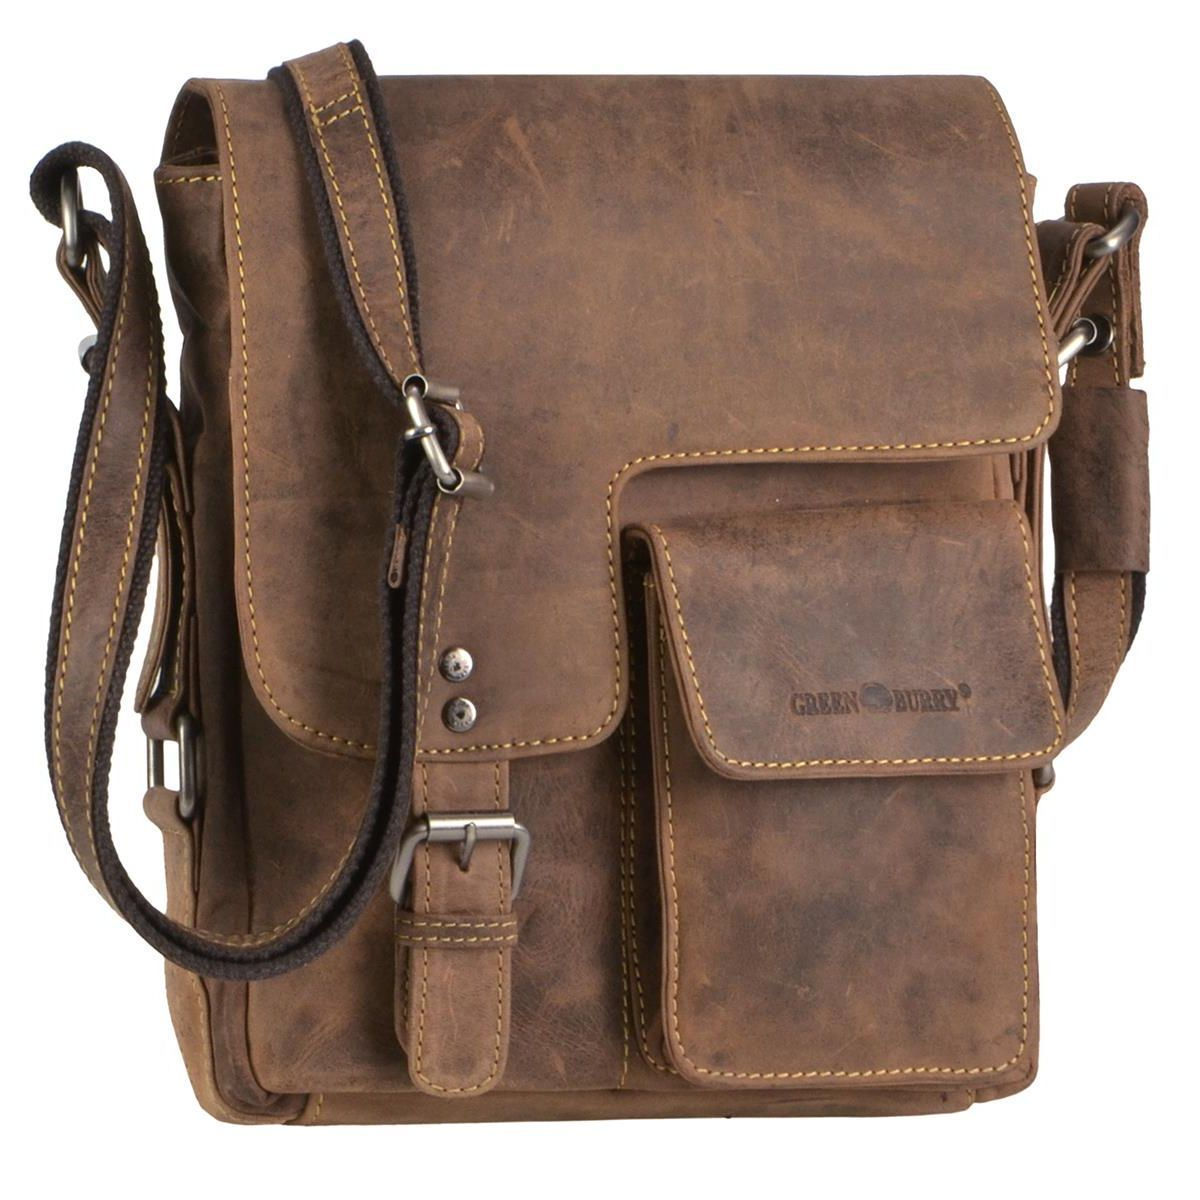 BININBOX Men Shoulder Business Messenger Briefcase Sling Chest Bag Cross Body